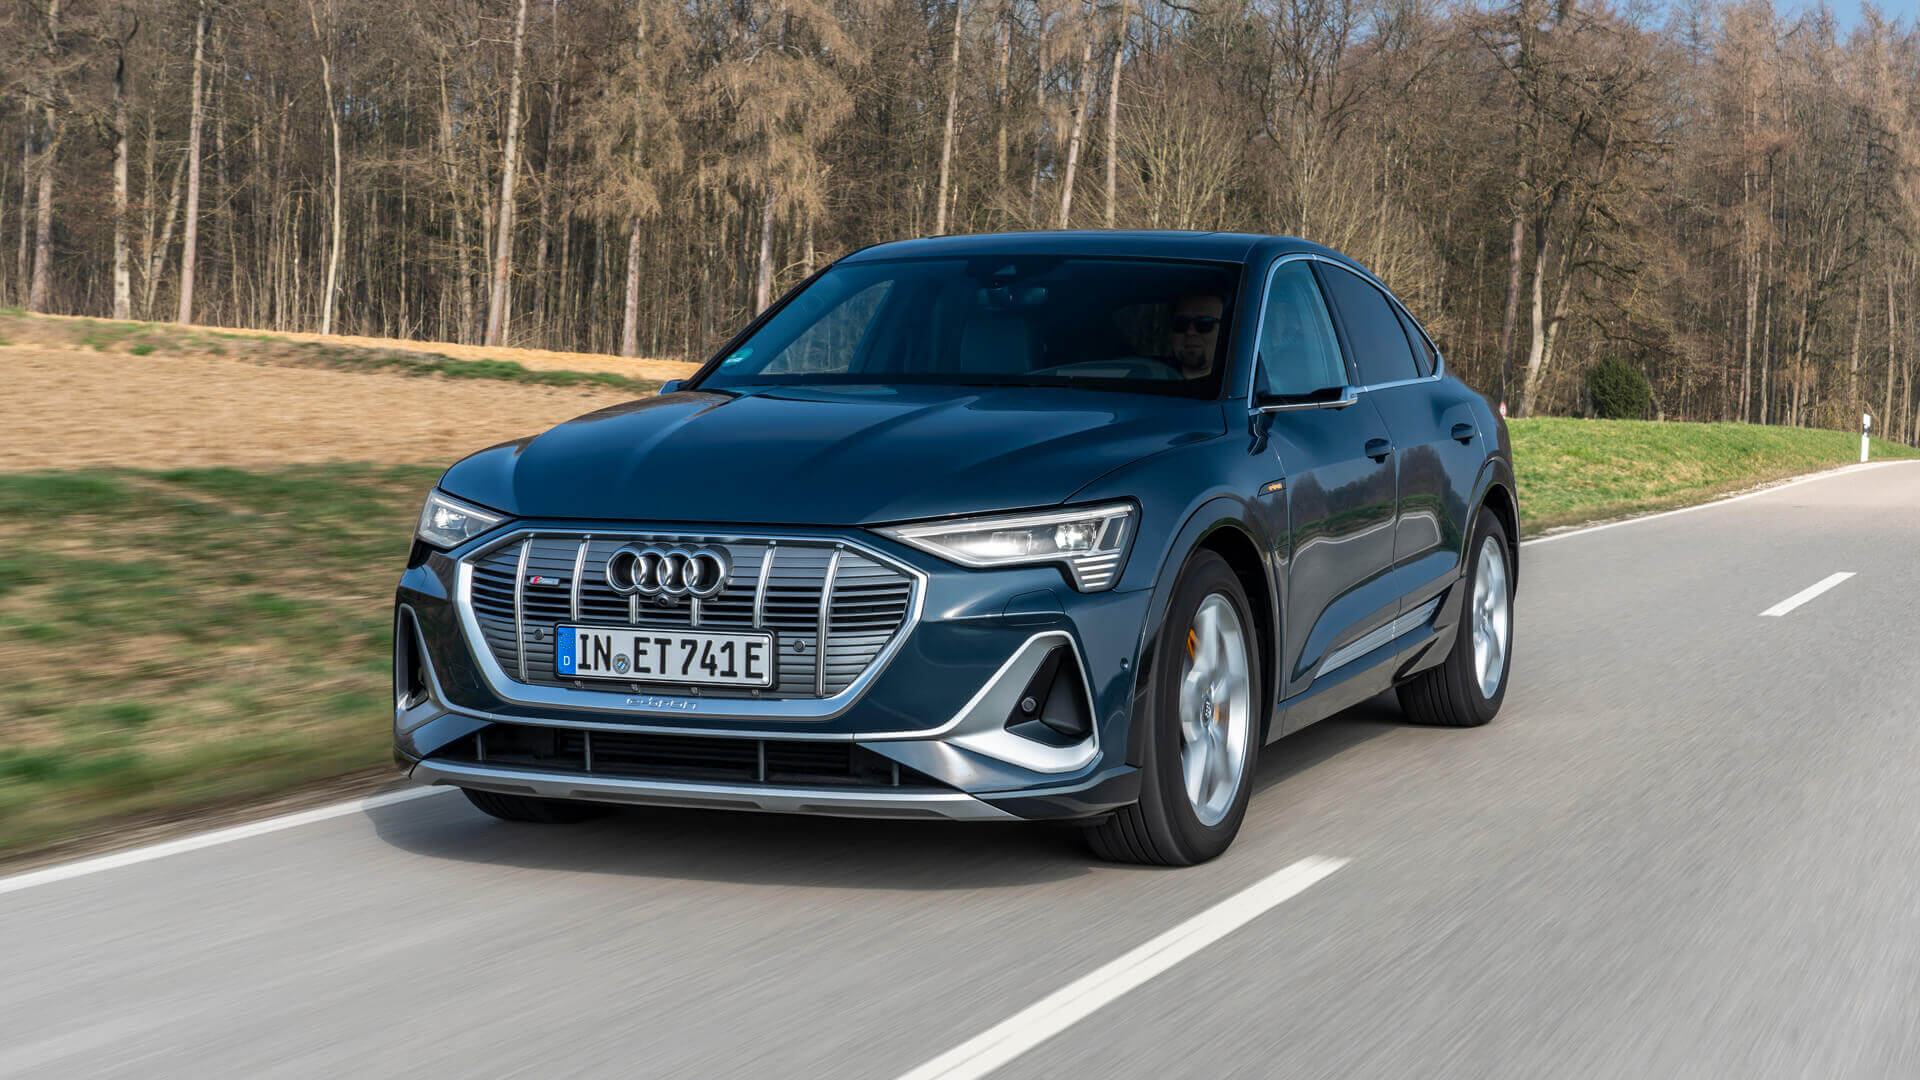 Фотография экоавто Audi e-tron Sportback 55 quattro - фото 12